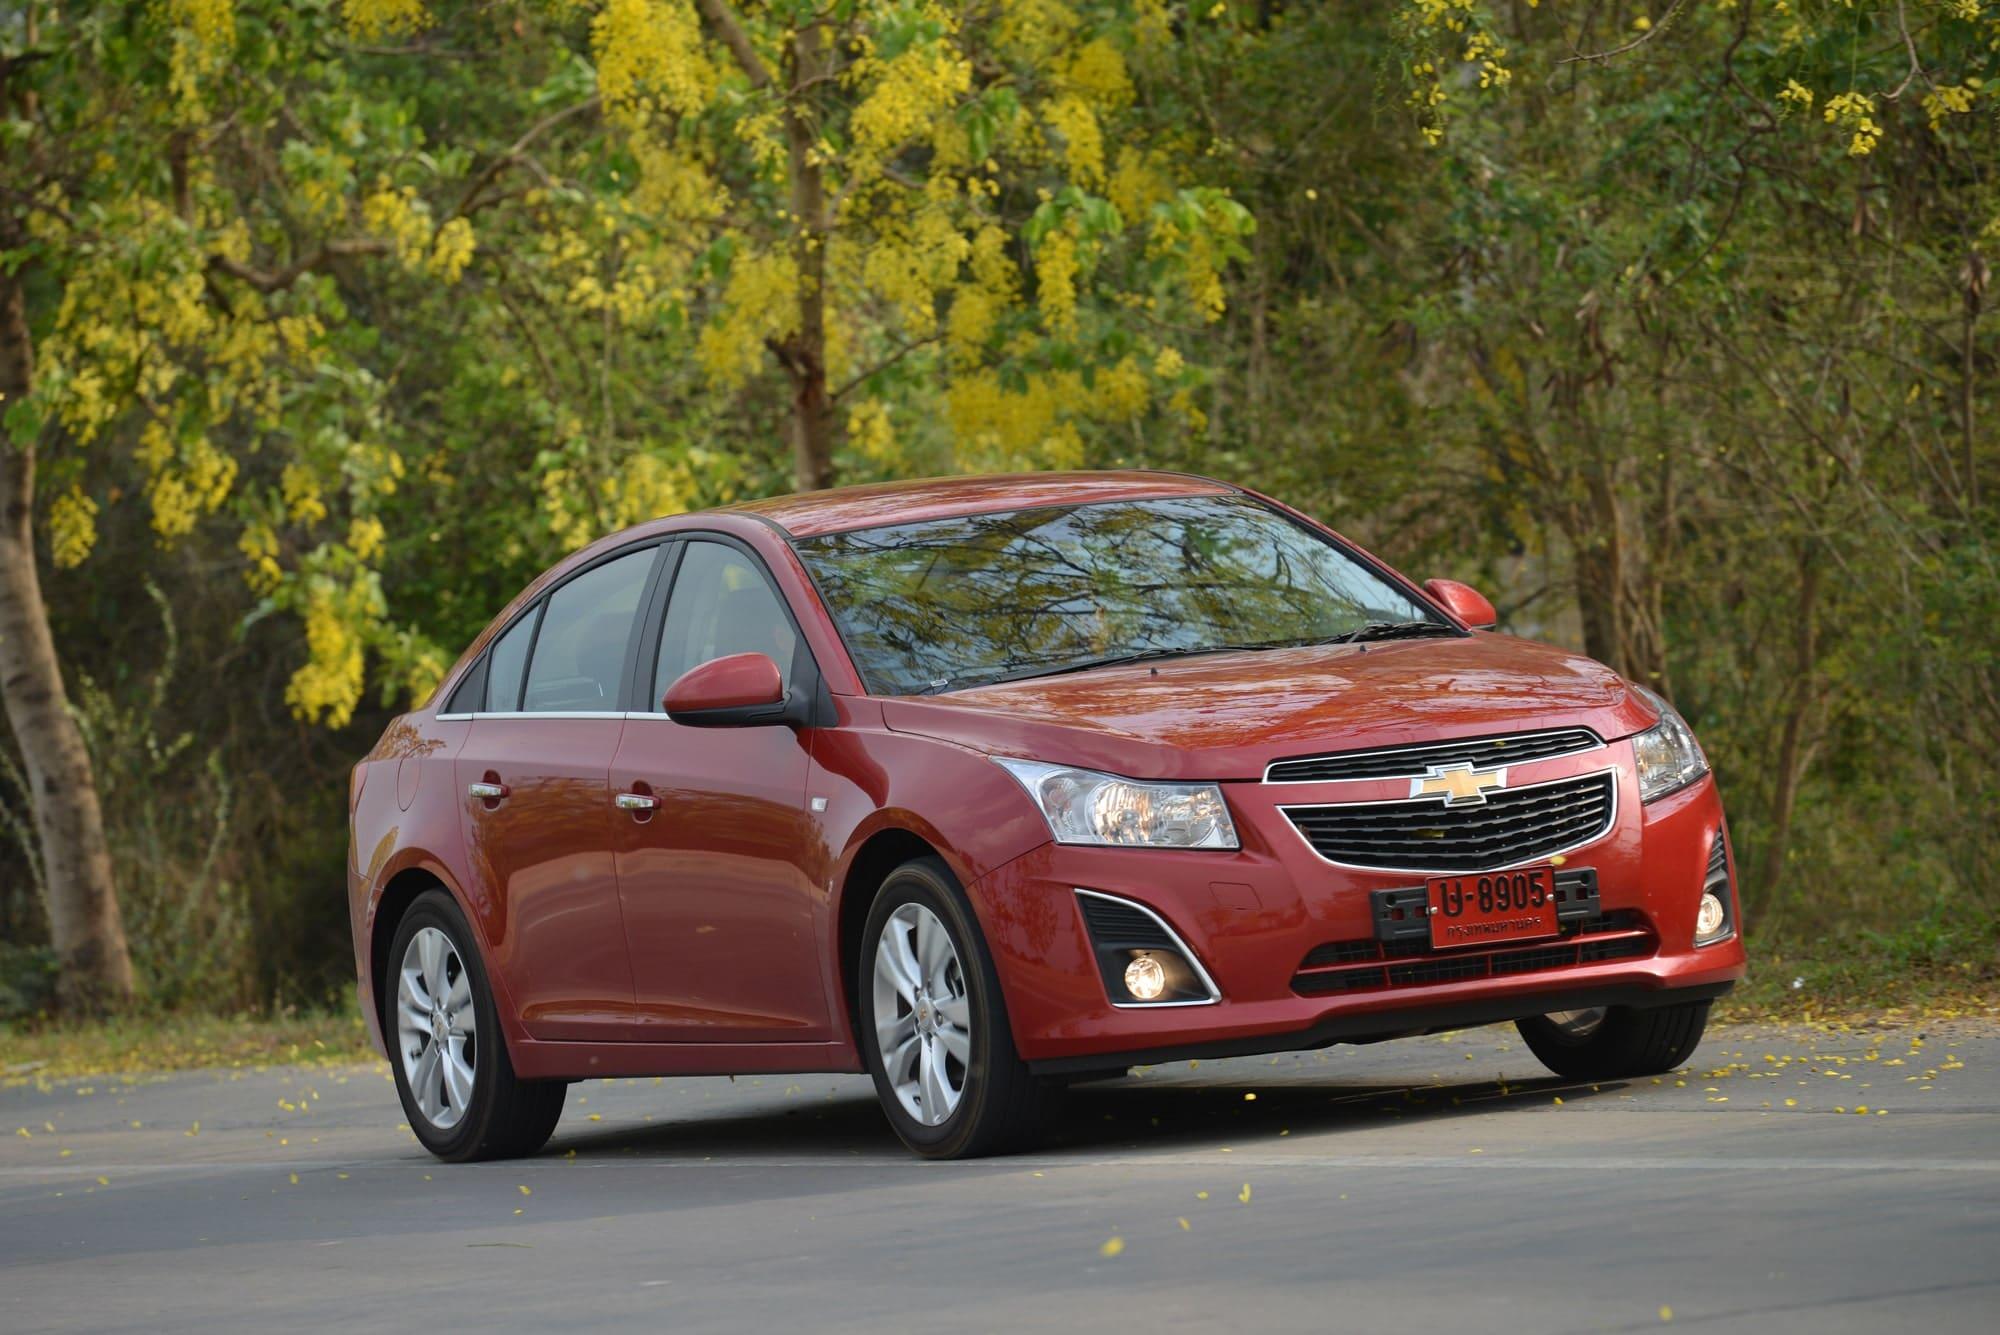 Chevrolet PH Recalls Chevrolet Cruze, Orlando, Sonic for Defective Takata Driver's Airbags